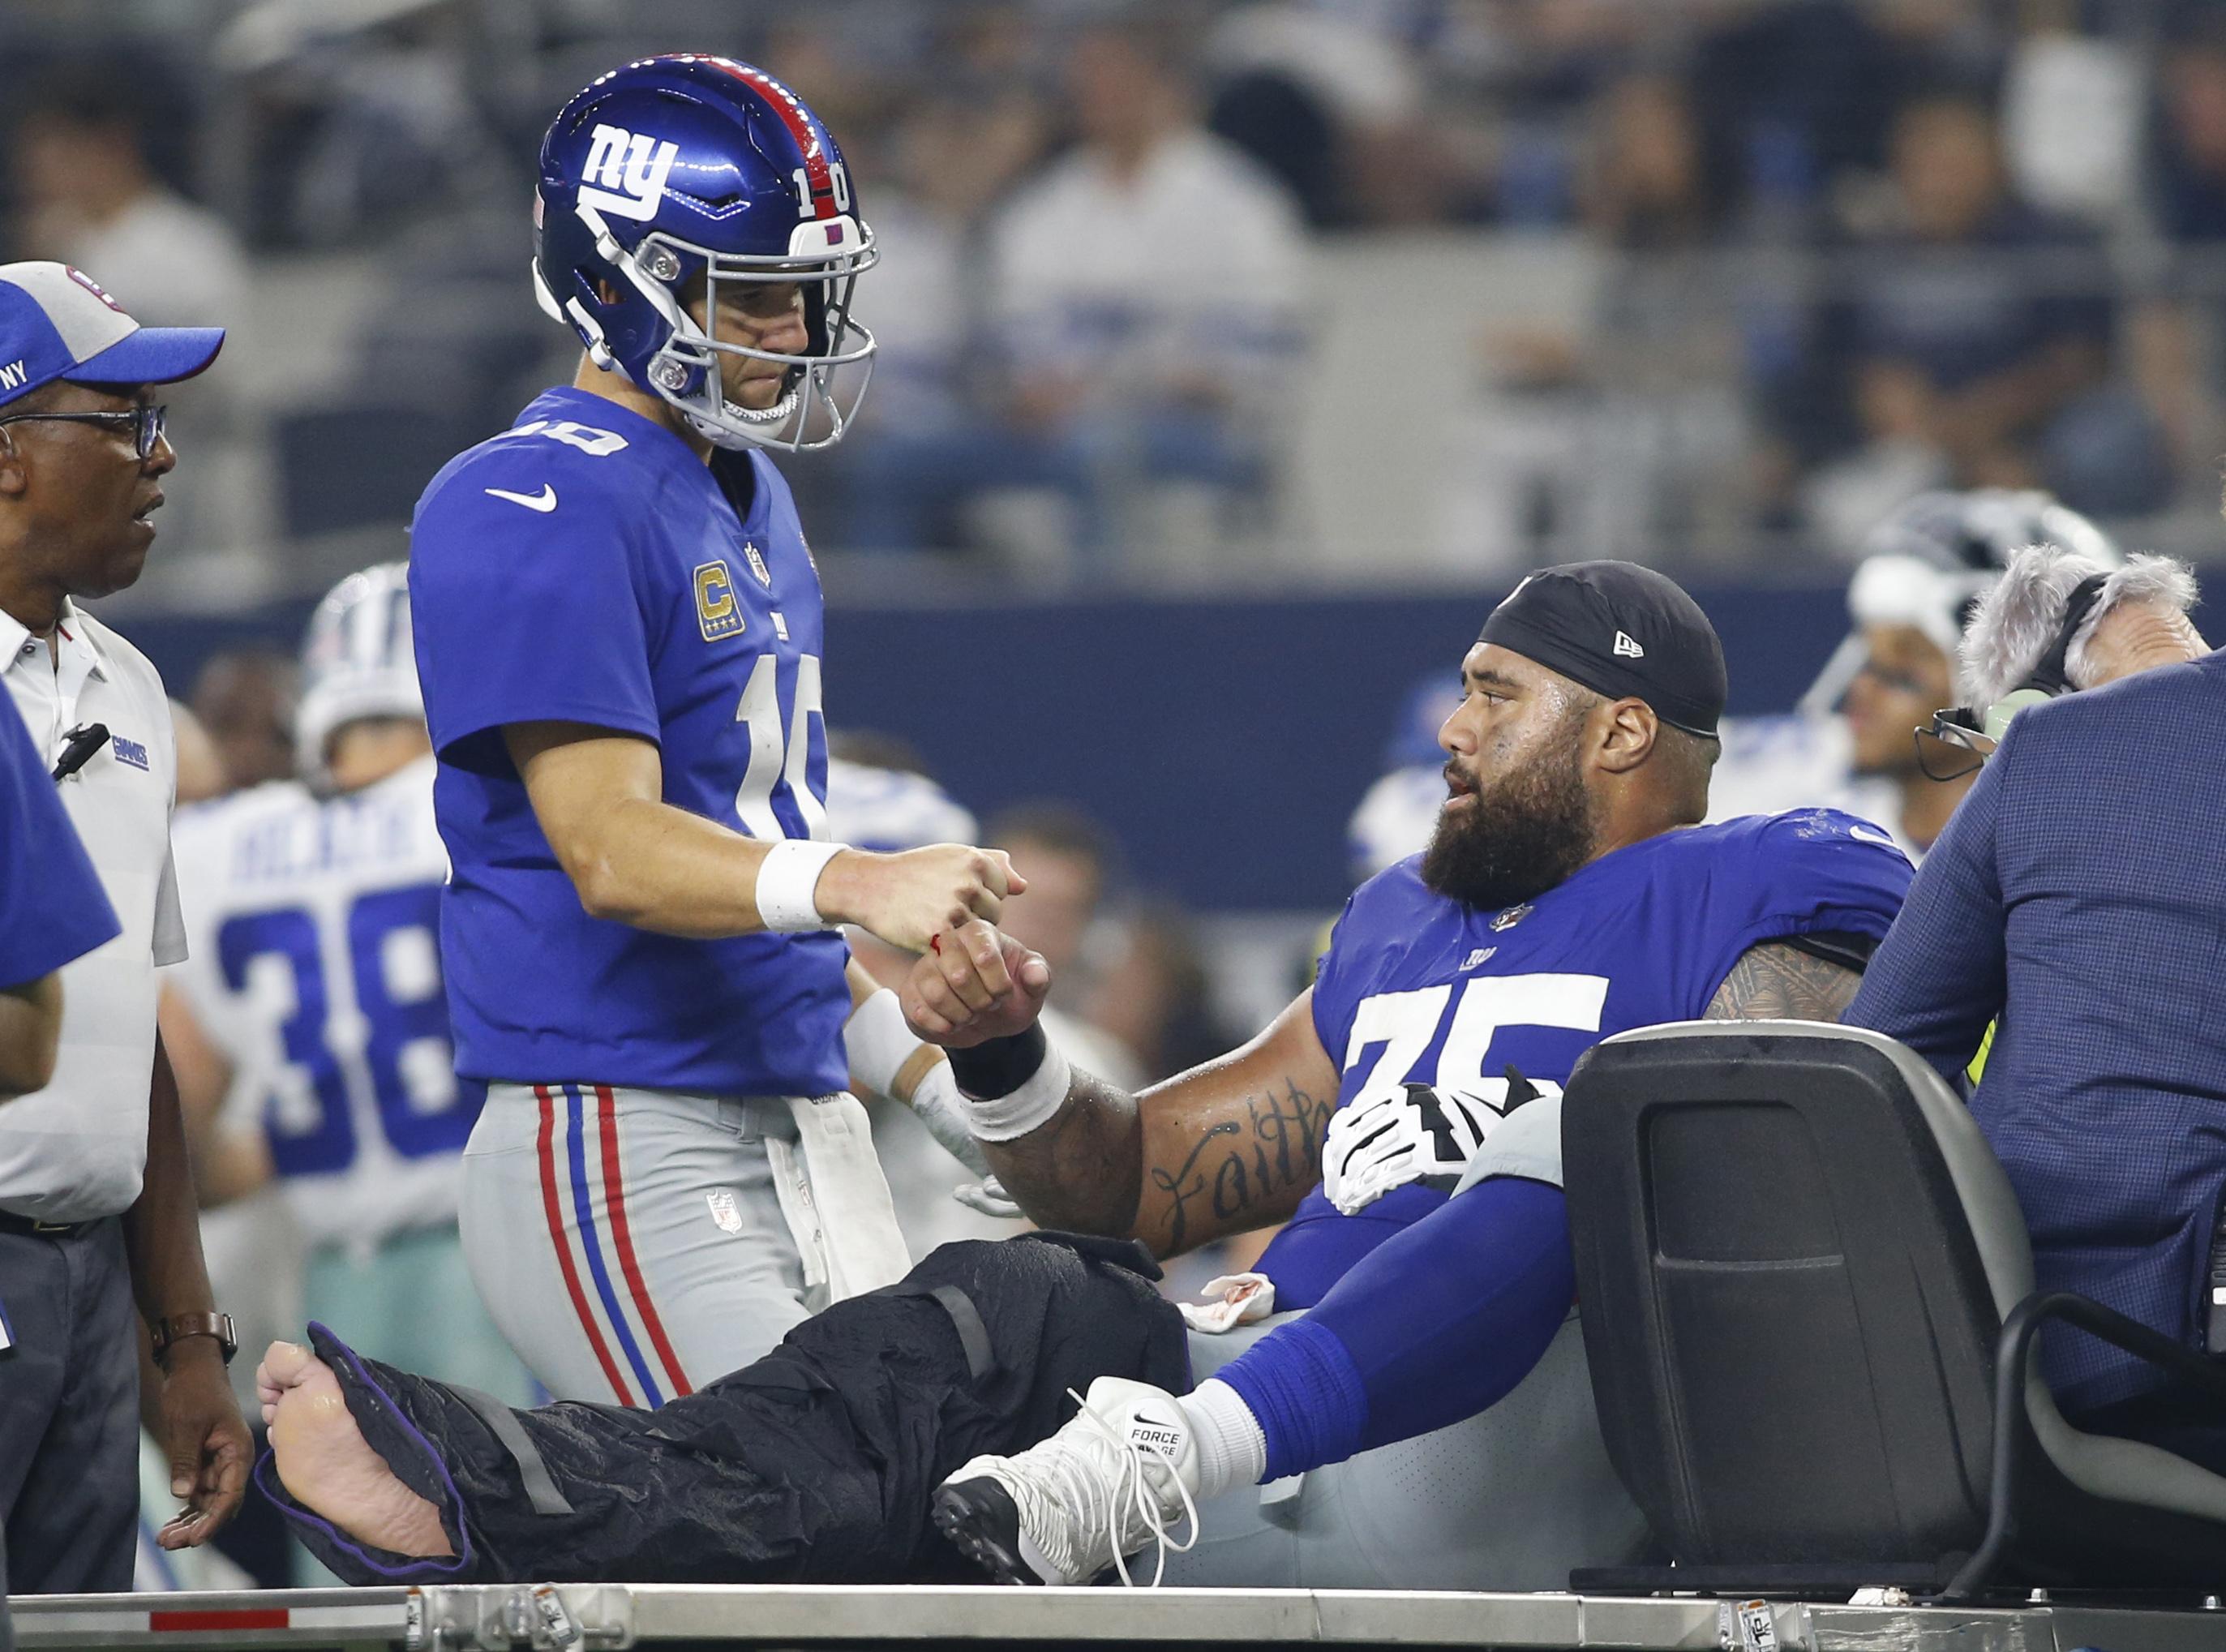 Jon Halapio's Season-Ending Injury Just Adds To The Giants' Early Woes